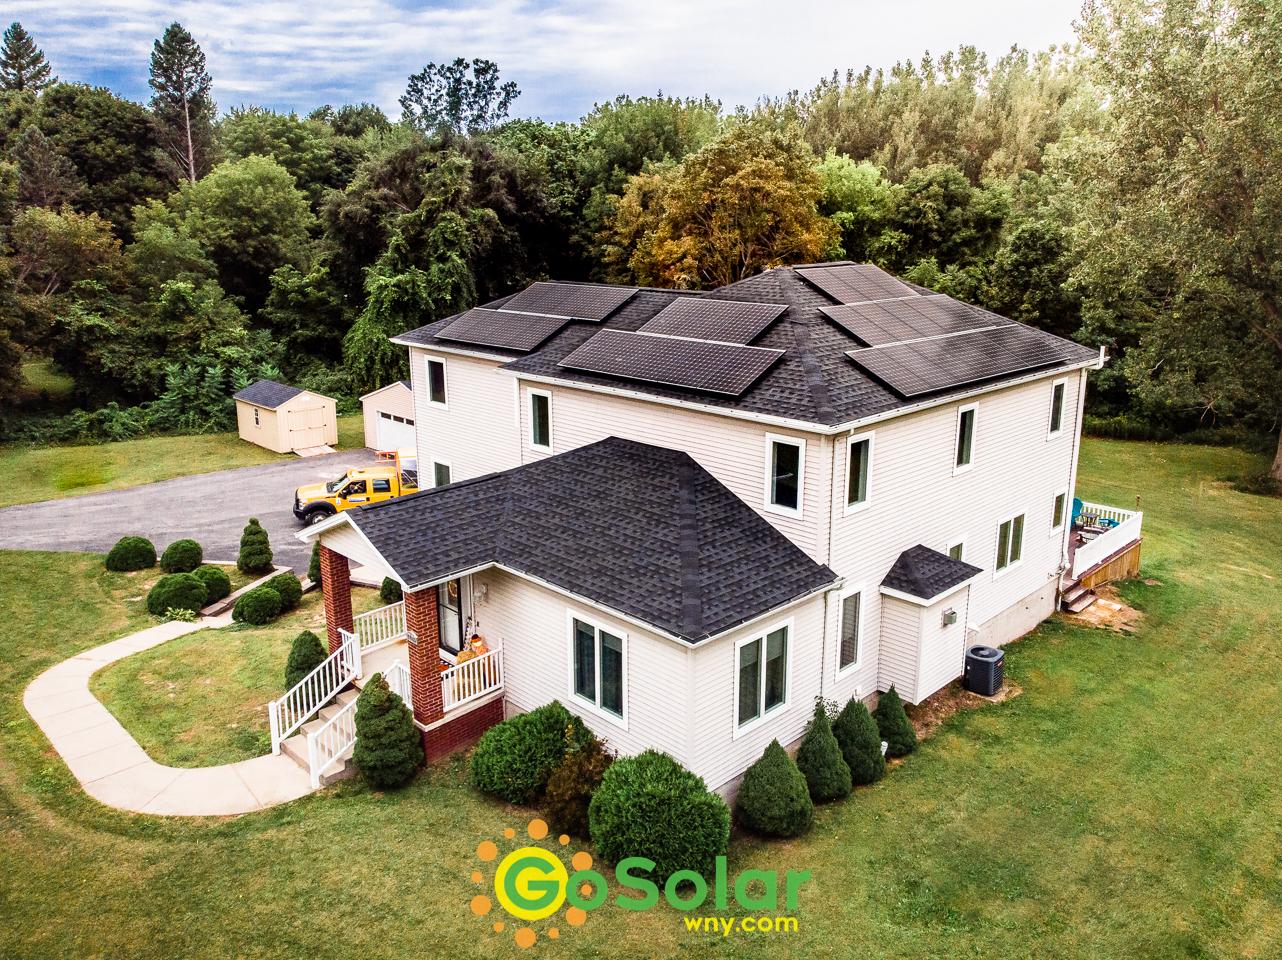 Panasonic Solar Panels, Solar Panel Installer, Rooftop Solar Panels